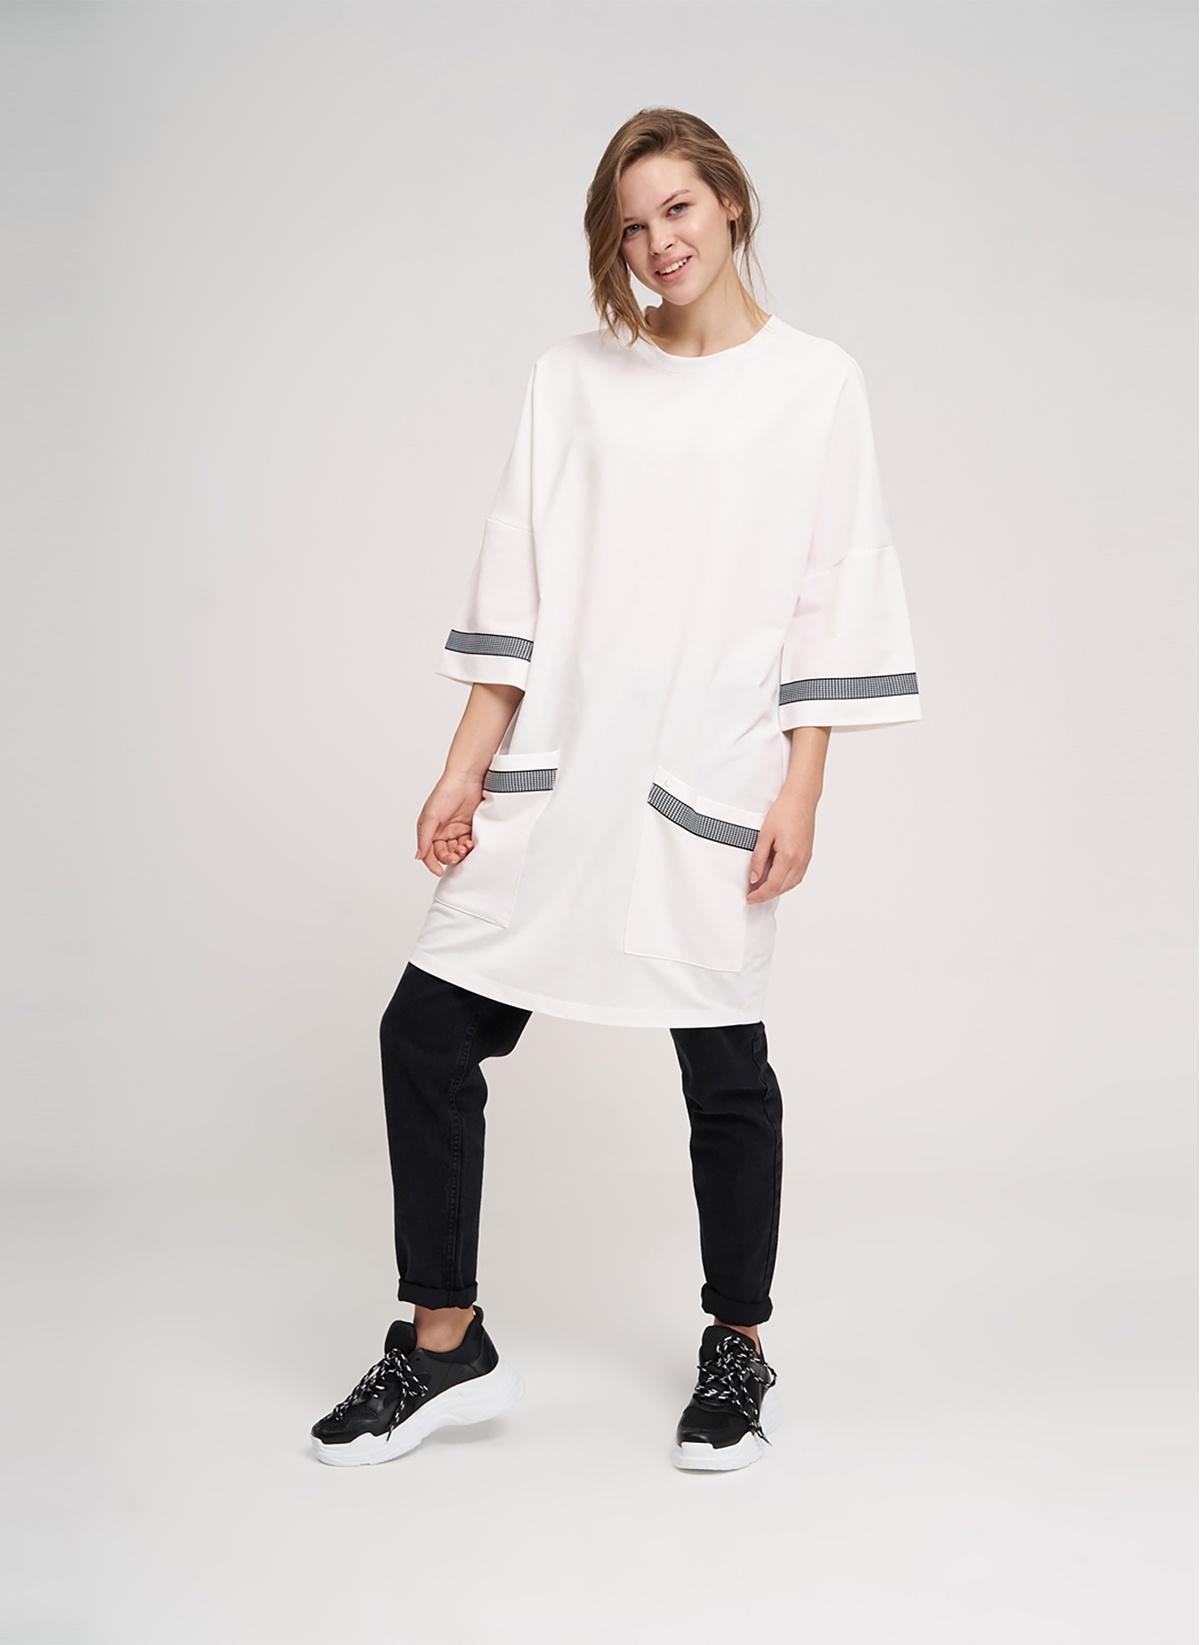 Mizalle Youth Kadın Sweatshirt Beyaz M Beden